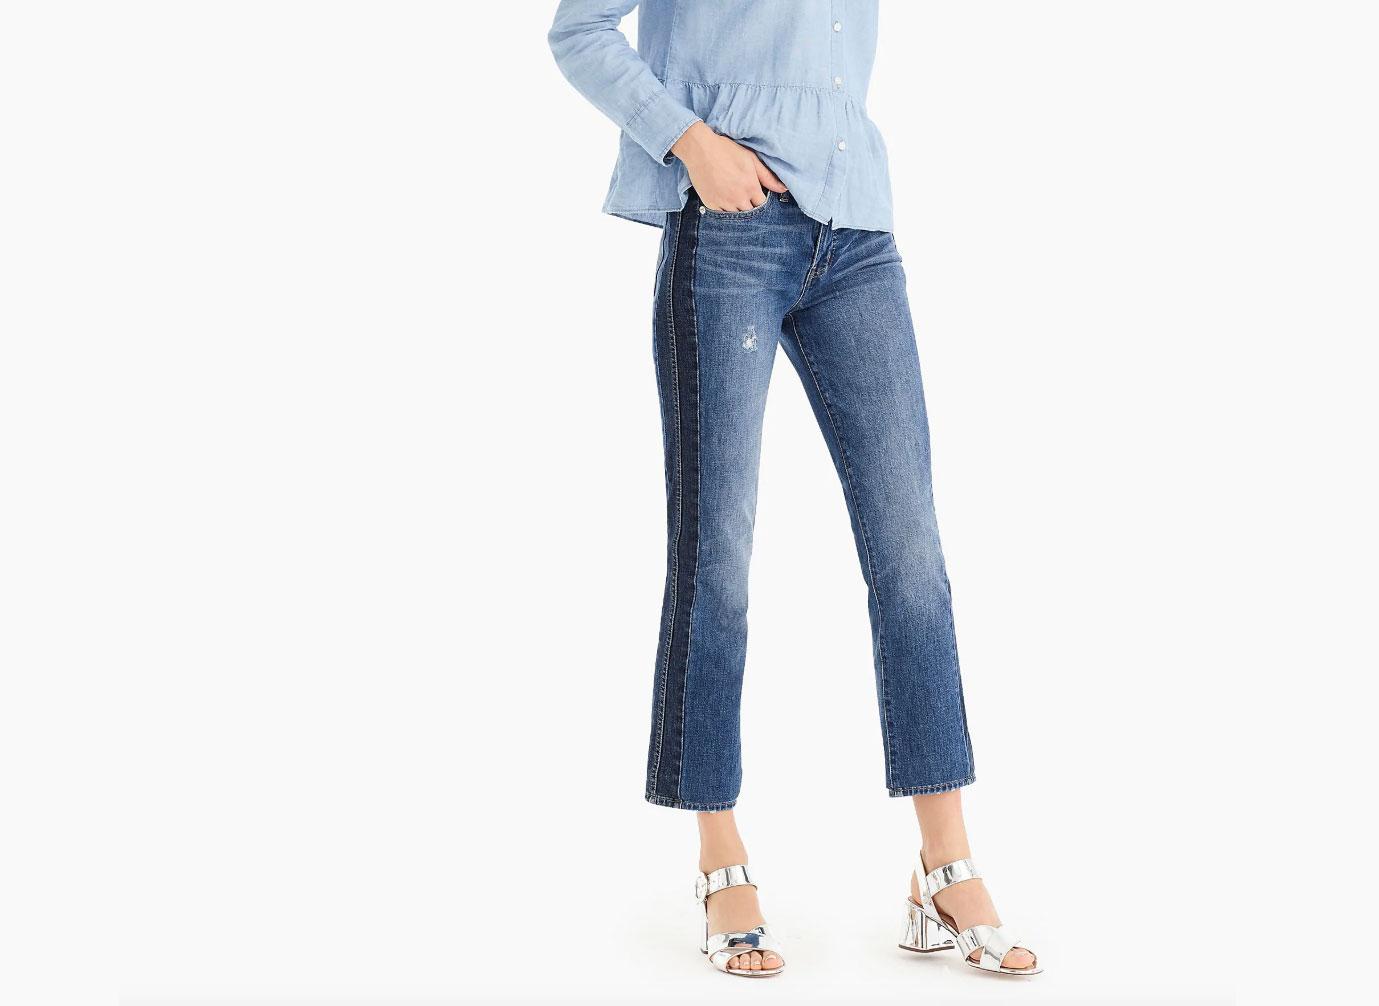 J.Crew Vintage Straight Jean in Two-Tone Denim